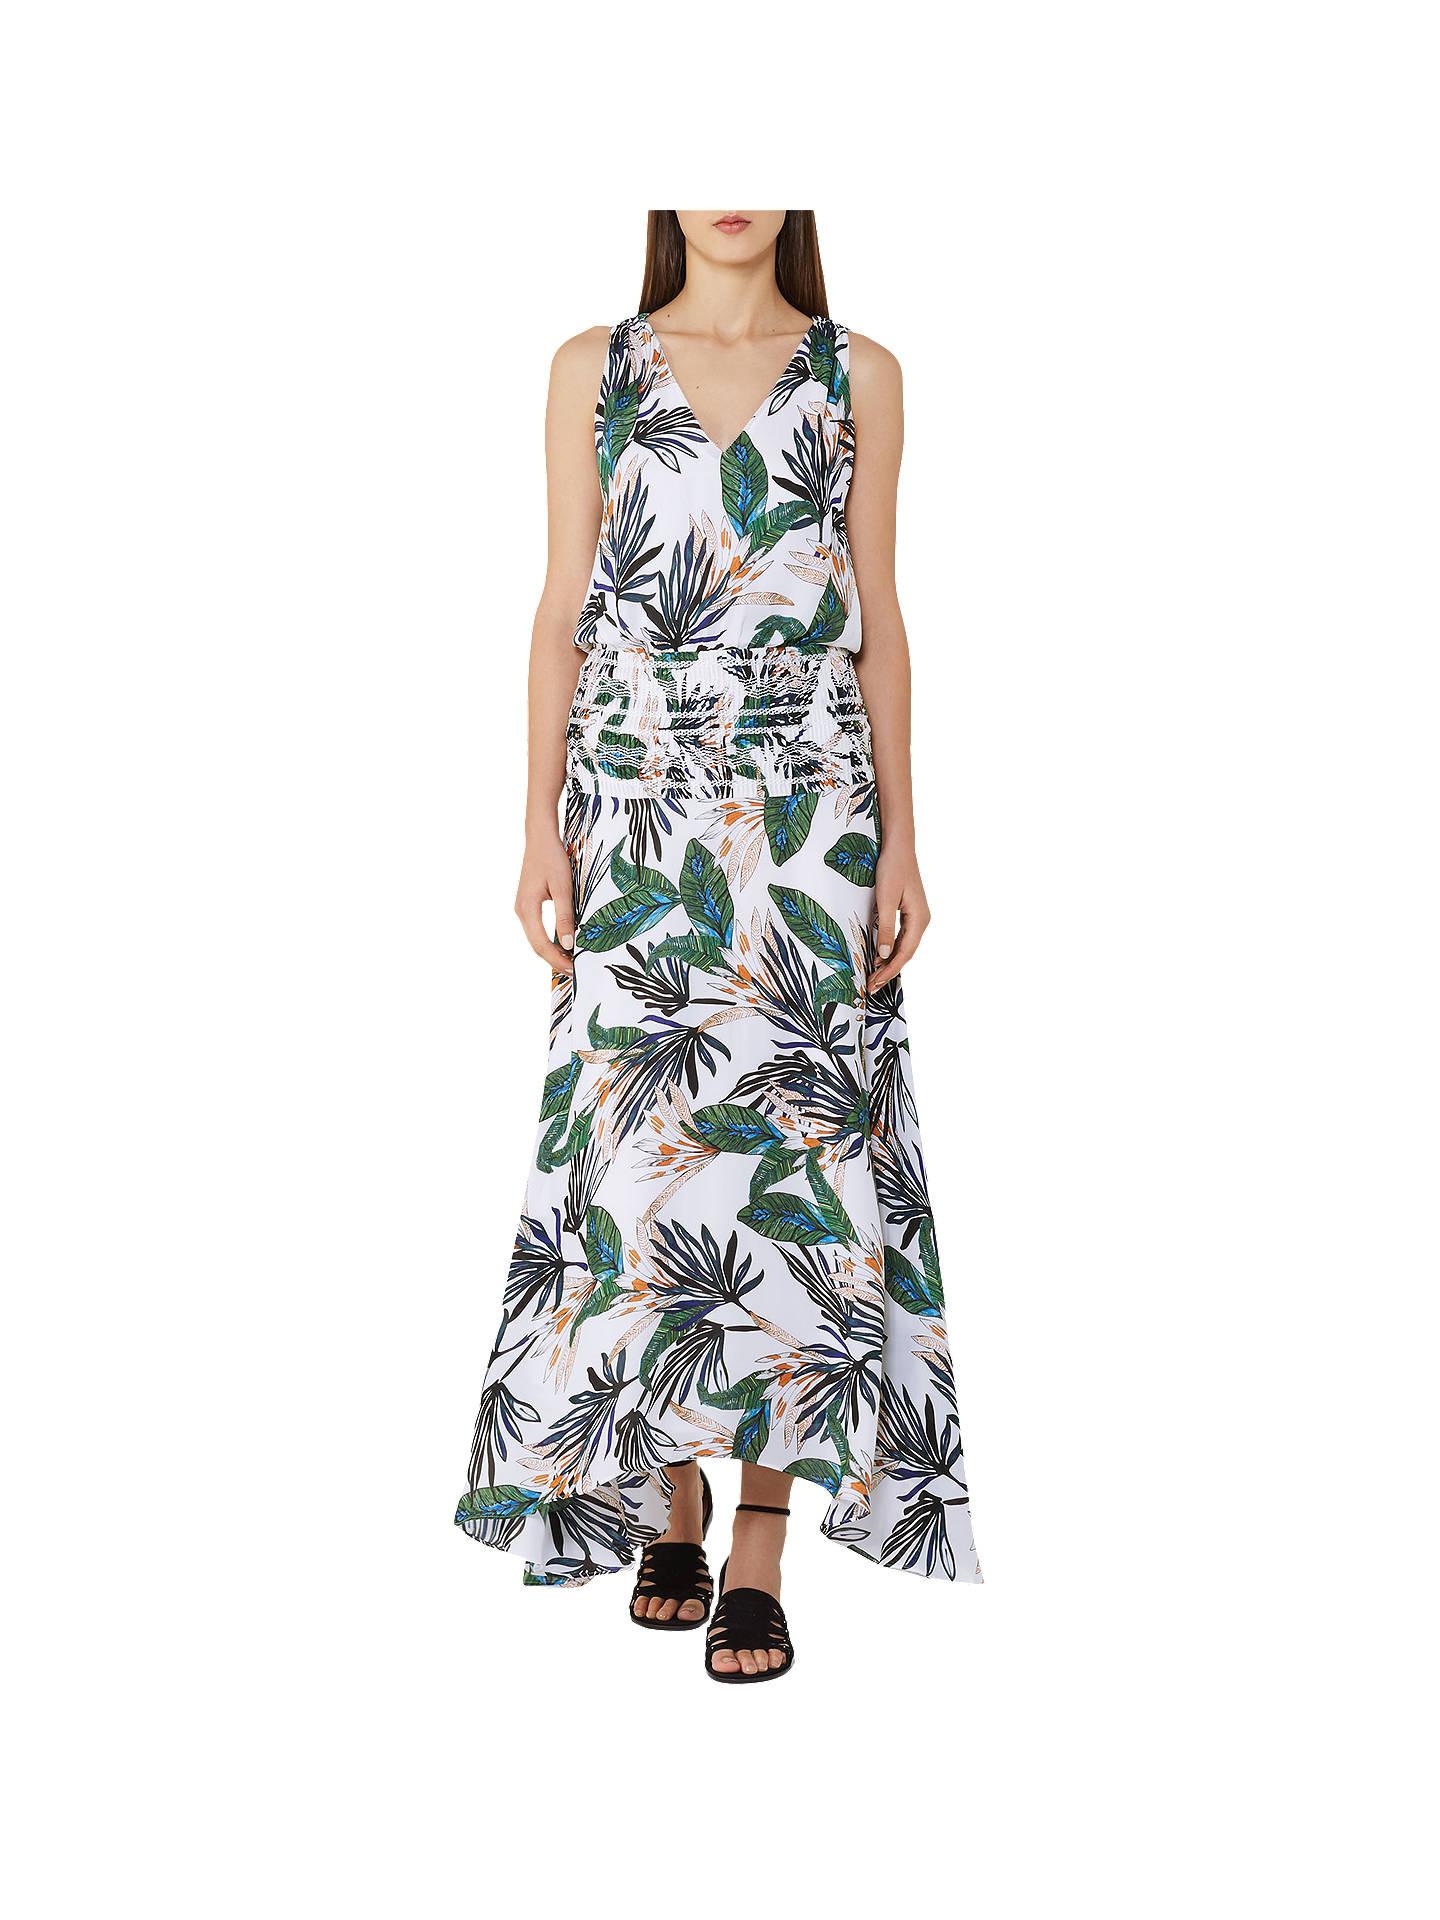 9be23067f84 Buy Reiss Silk Palm Print Maxi Dress